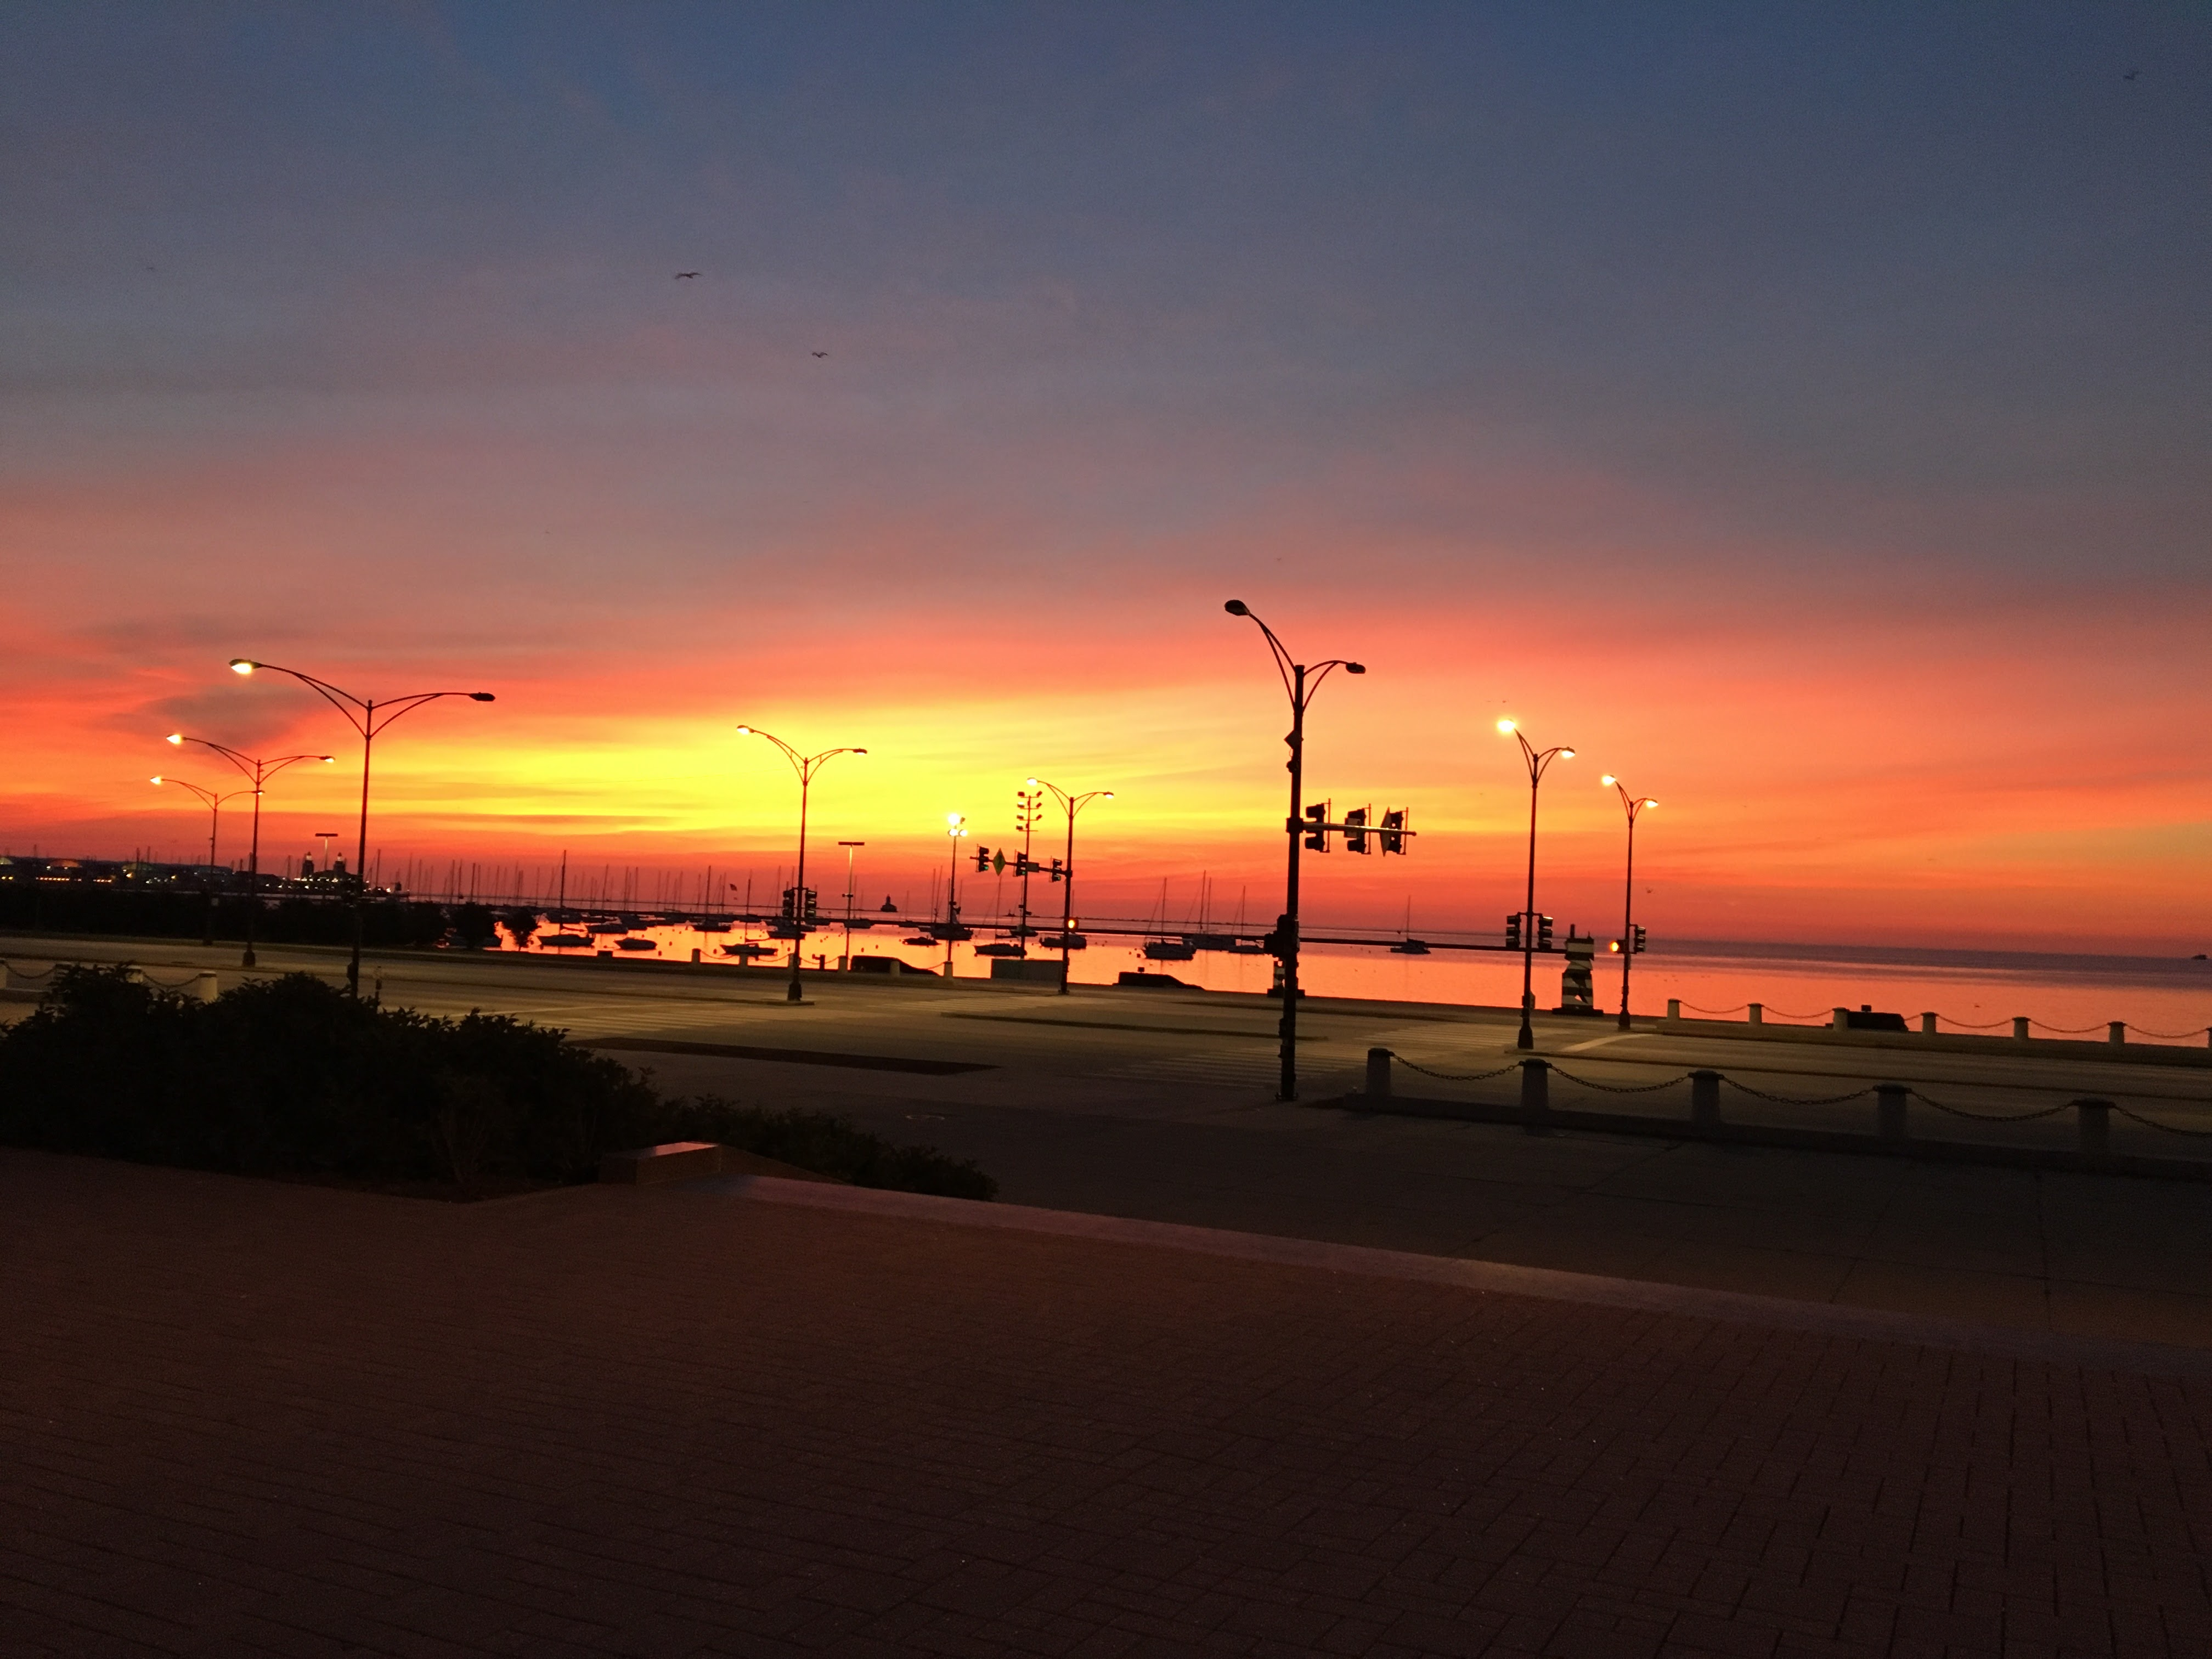 sunrise early